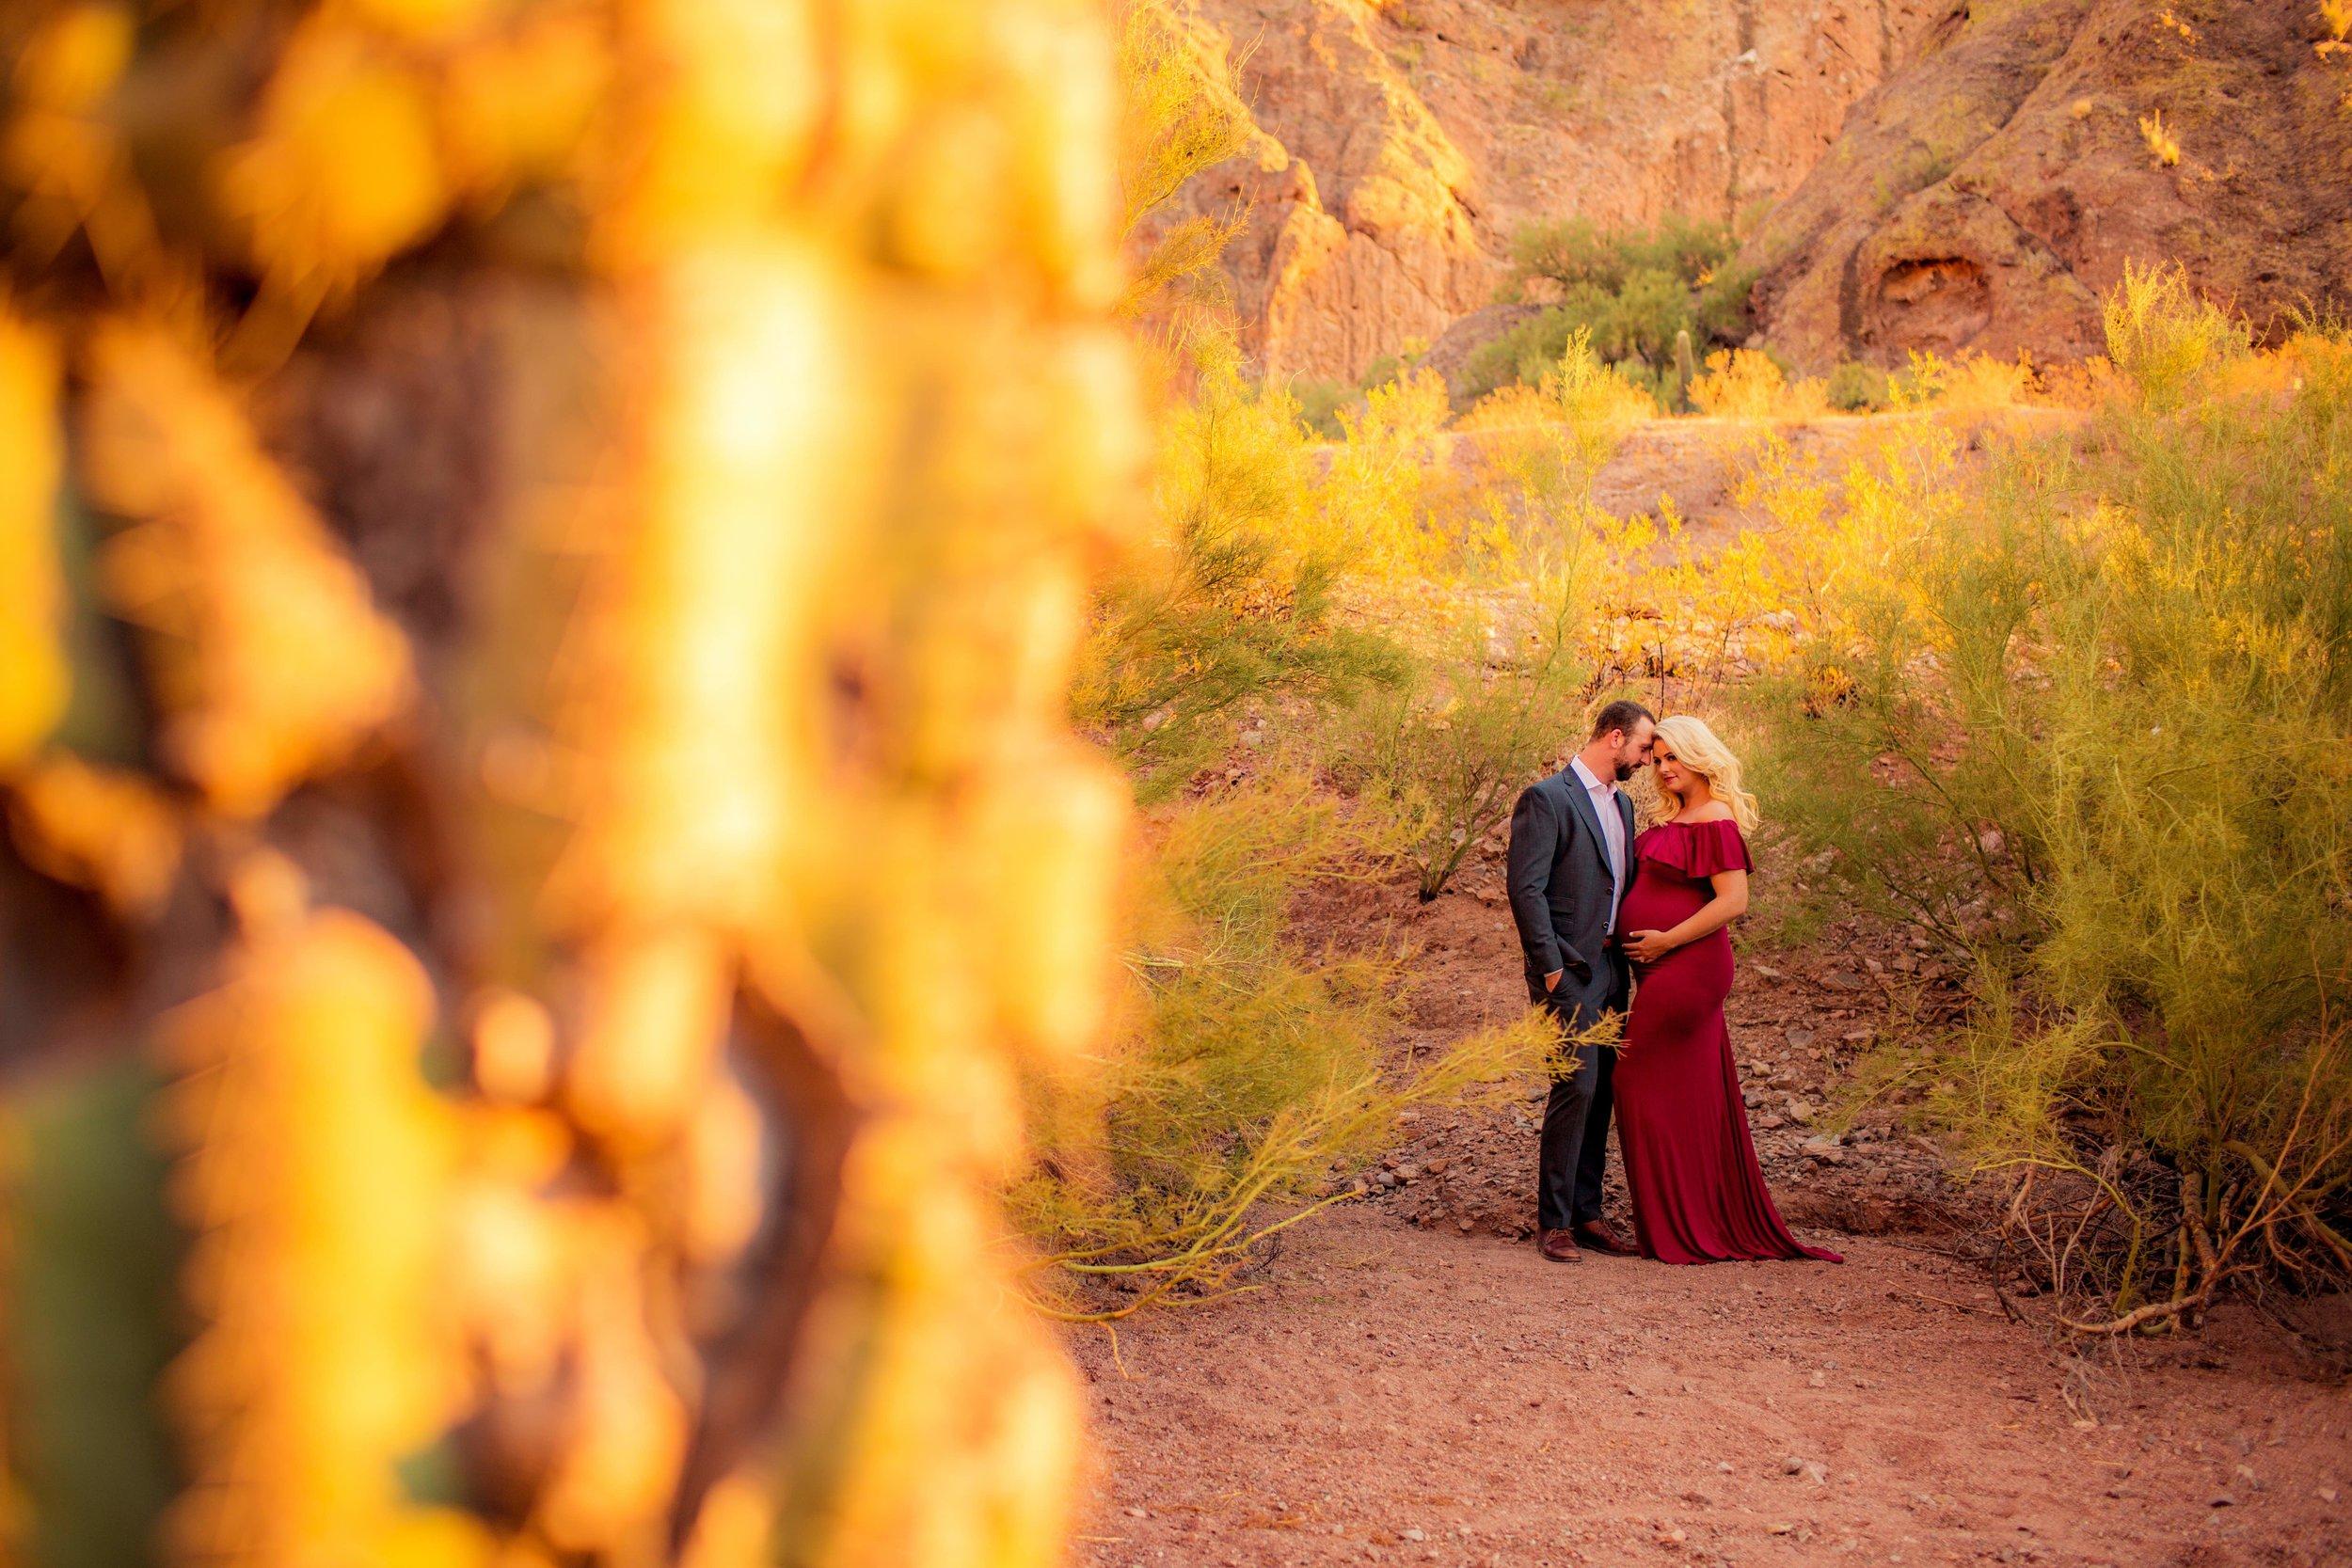 -colorado-wedding-photographer-denver-springs-vail-607A0176.jpeg